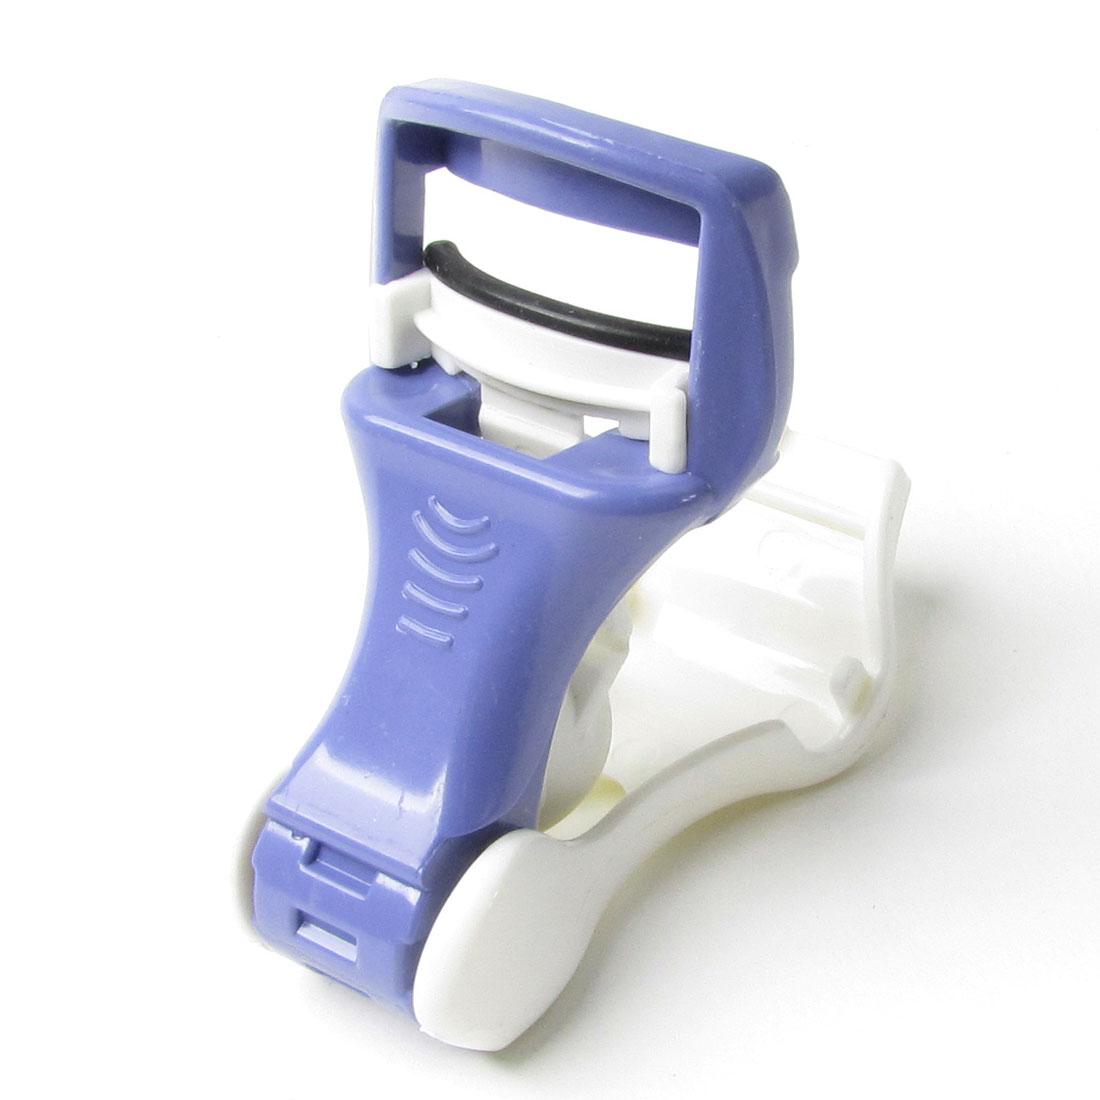 Plastic Handle Eyelash Curler Makeup Tool White Blue for Women Ladies